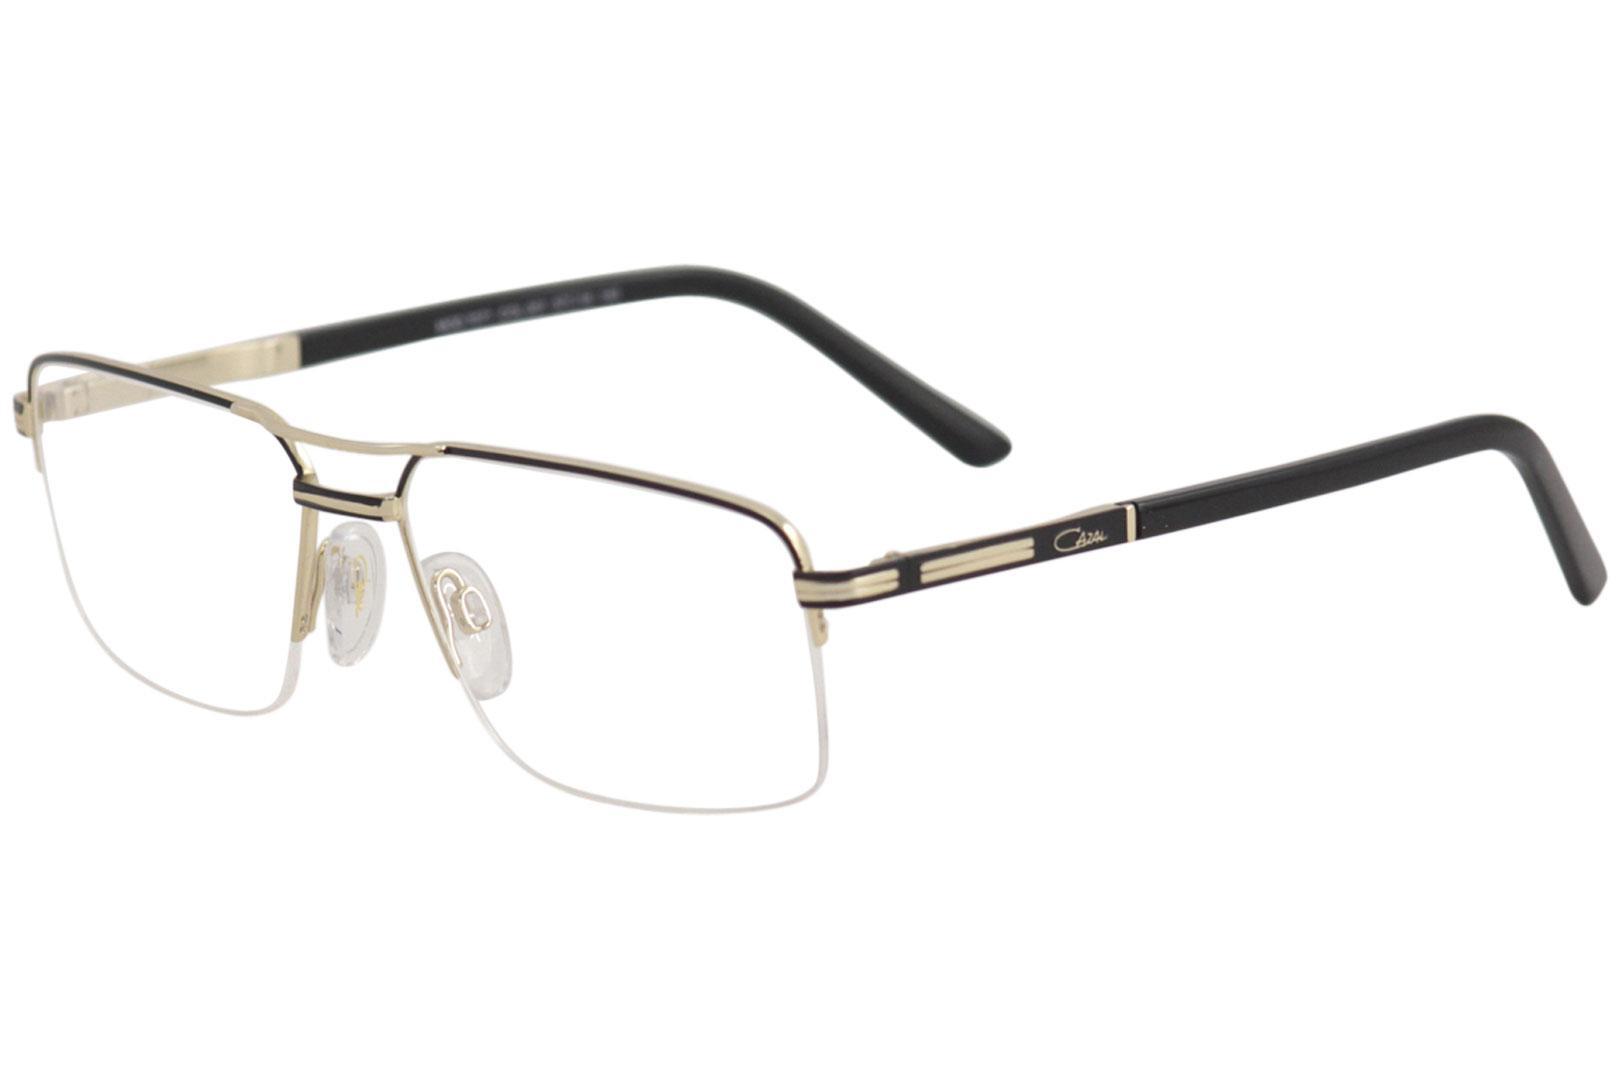 e55c9dfc7caa Cazal Men s Eyeglasses 7071 Half Rim Optical Frame by Cazal. Touch to zoom